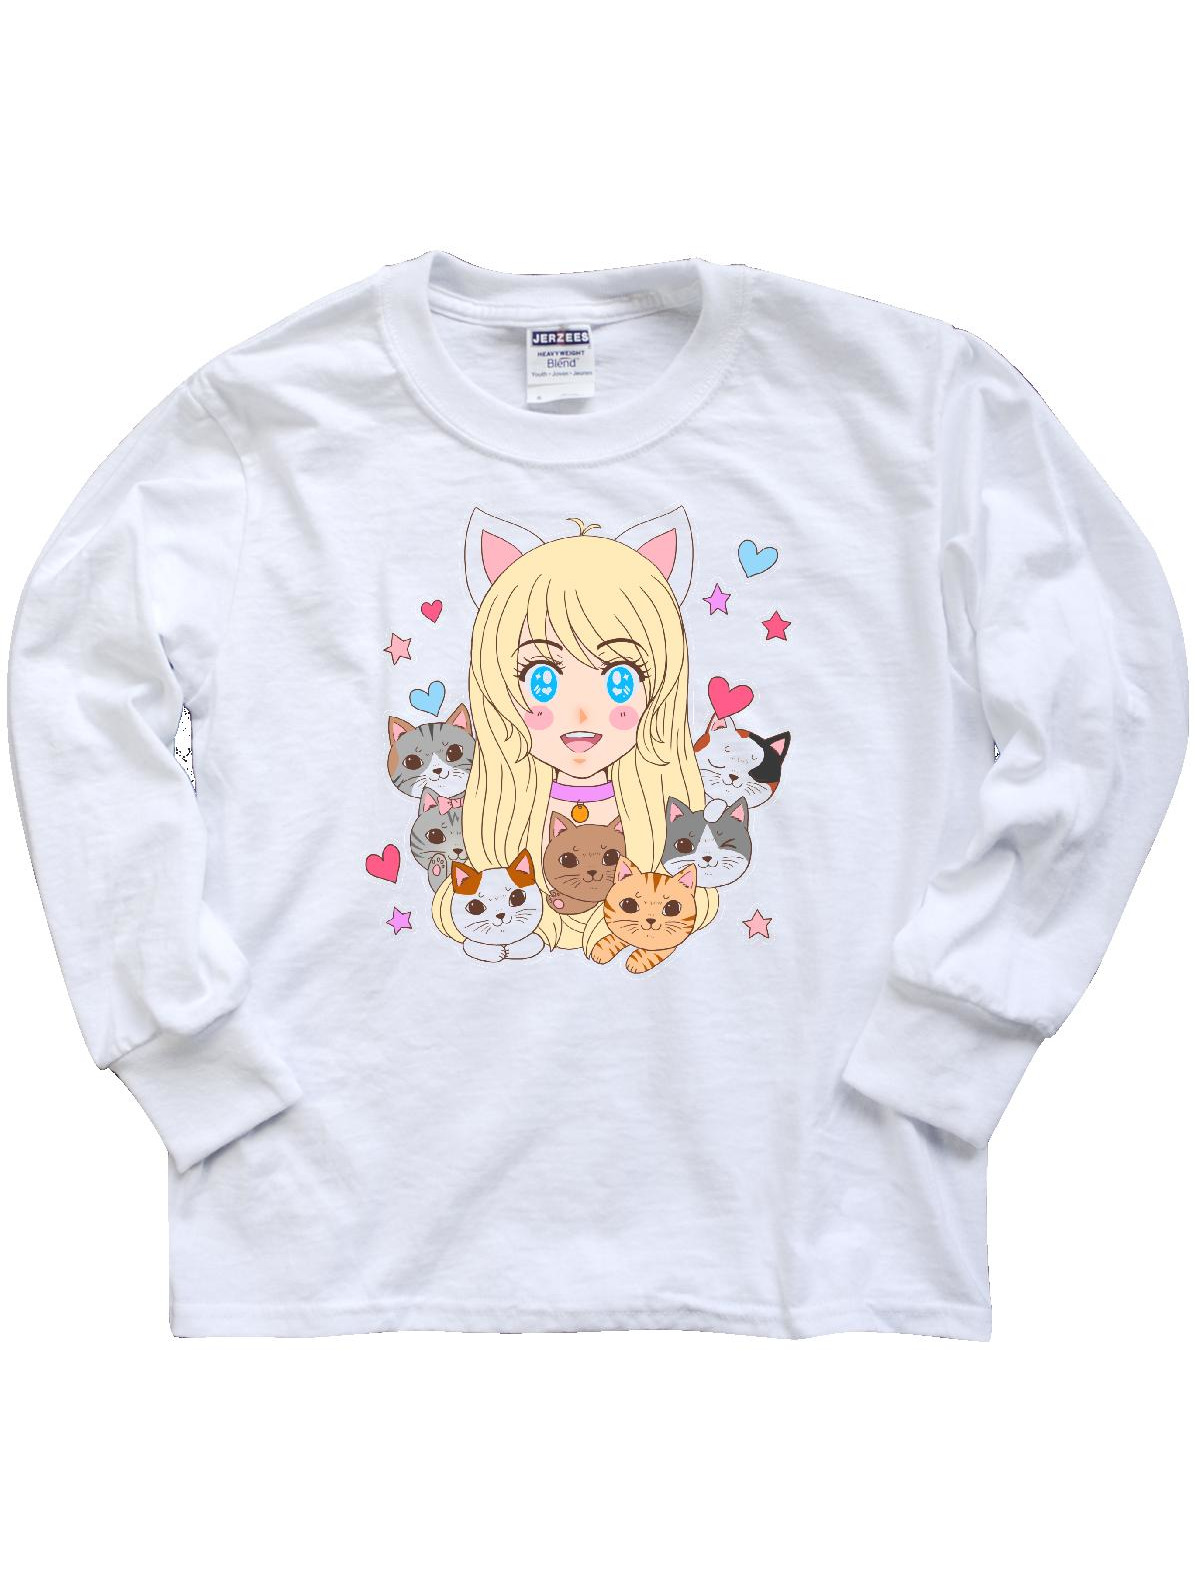 Neko Anime Girl with Kittens Youth Long Sleeve T-Shirt